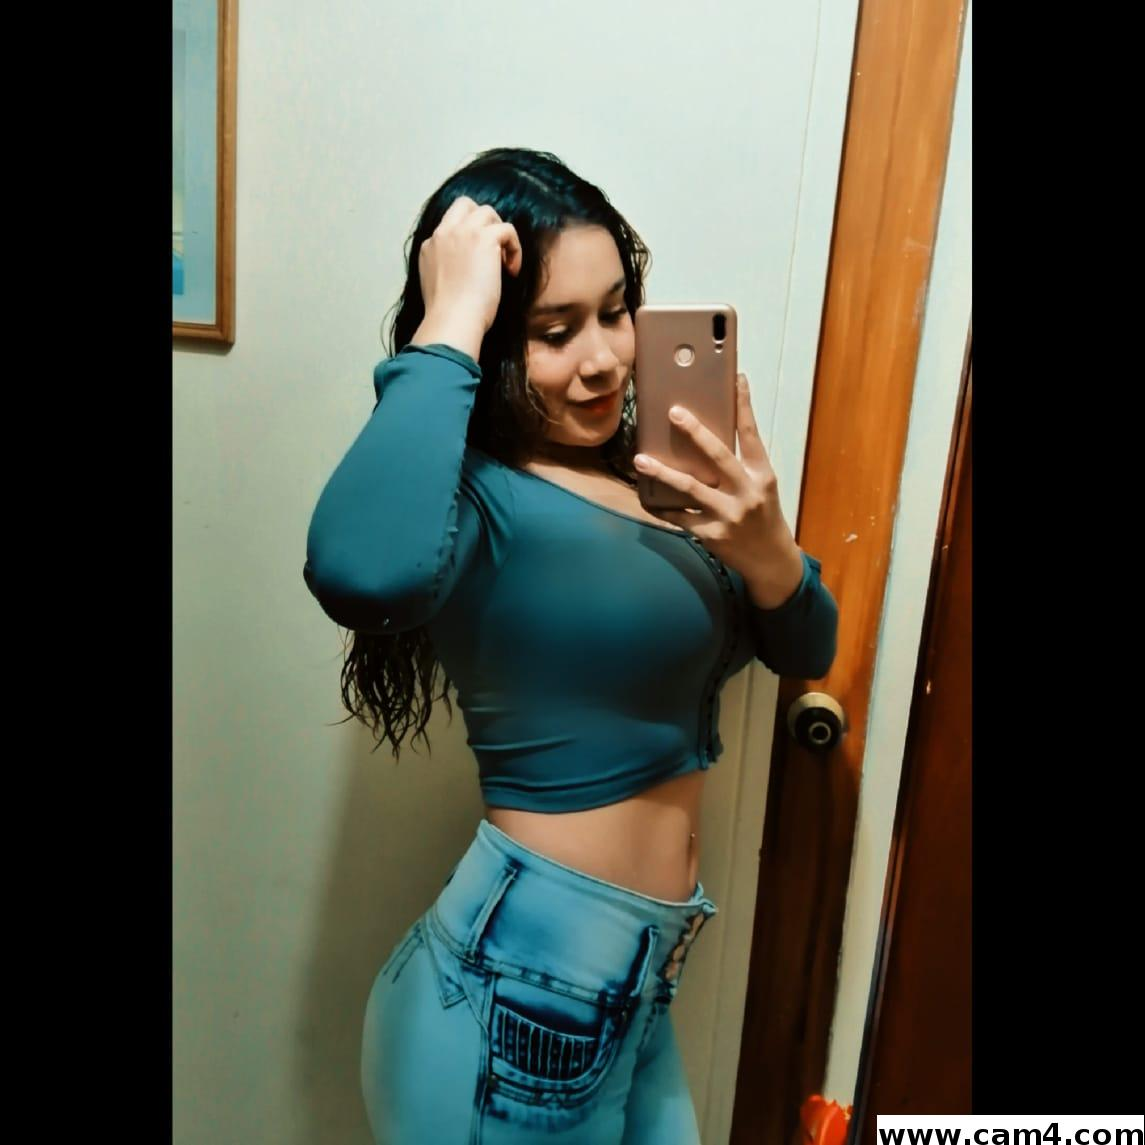 Samantha3 ?s=njpoch5be7tt3uit7tch+ir3g8oqo80wsefxv1+fk+m=